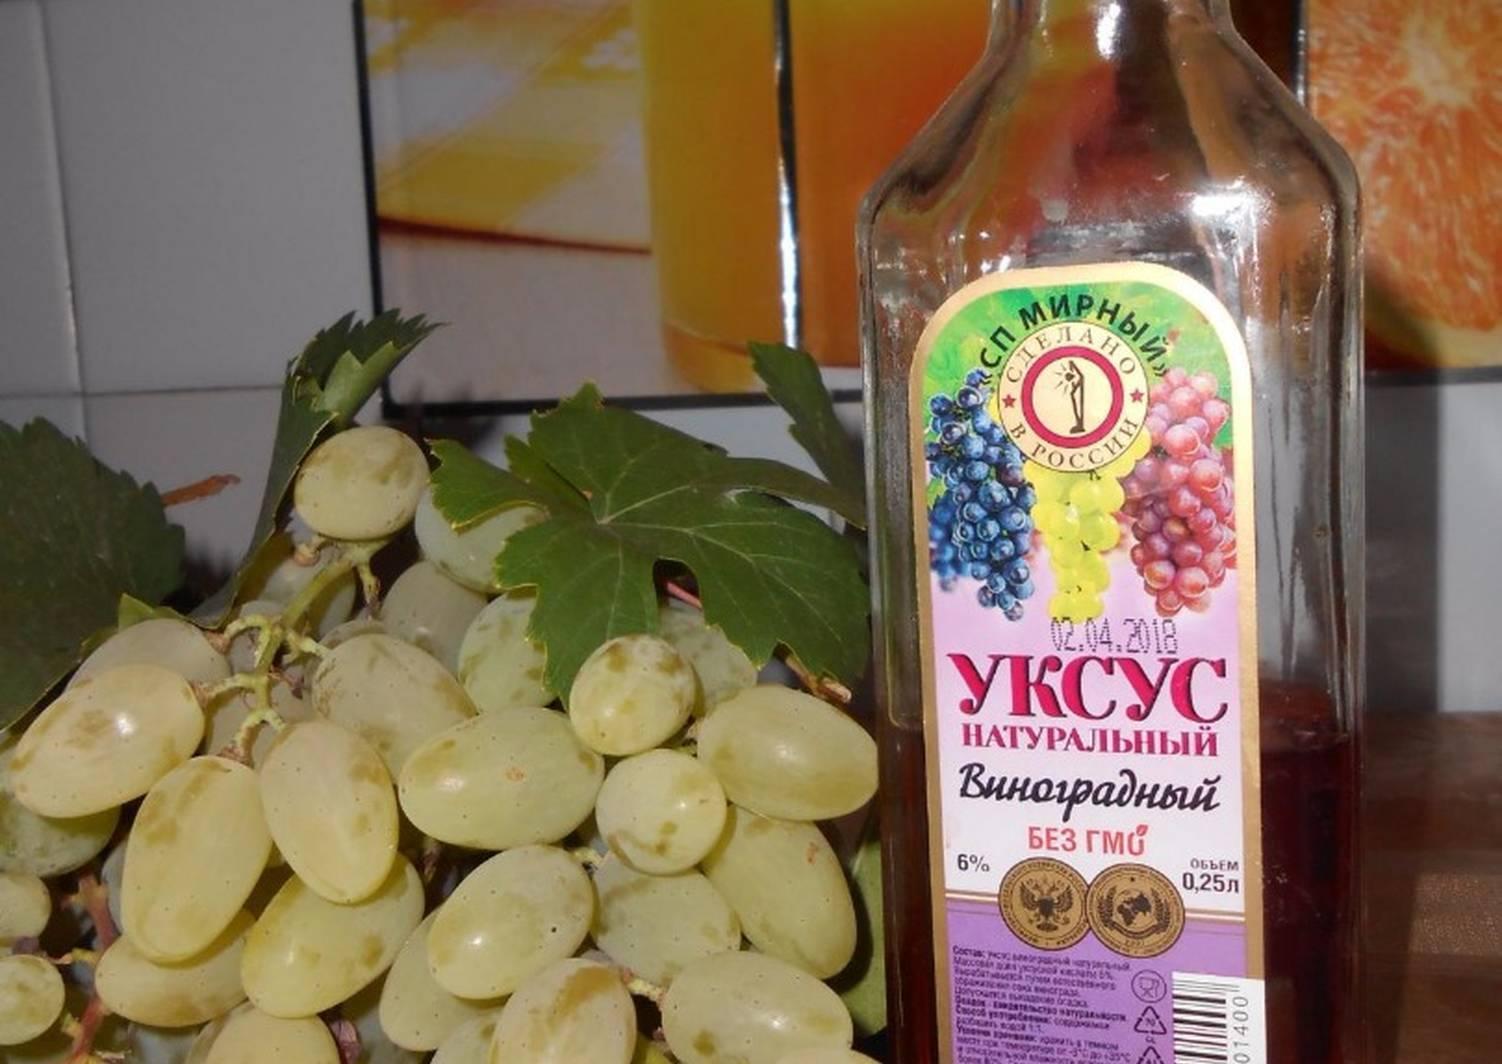 Домашний уксус из вина